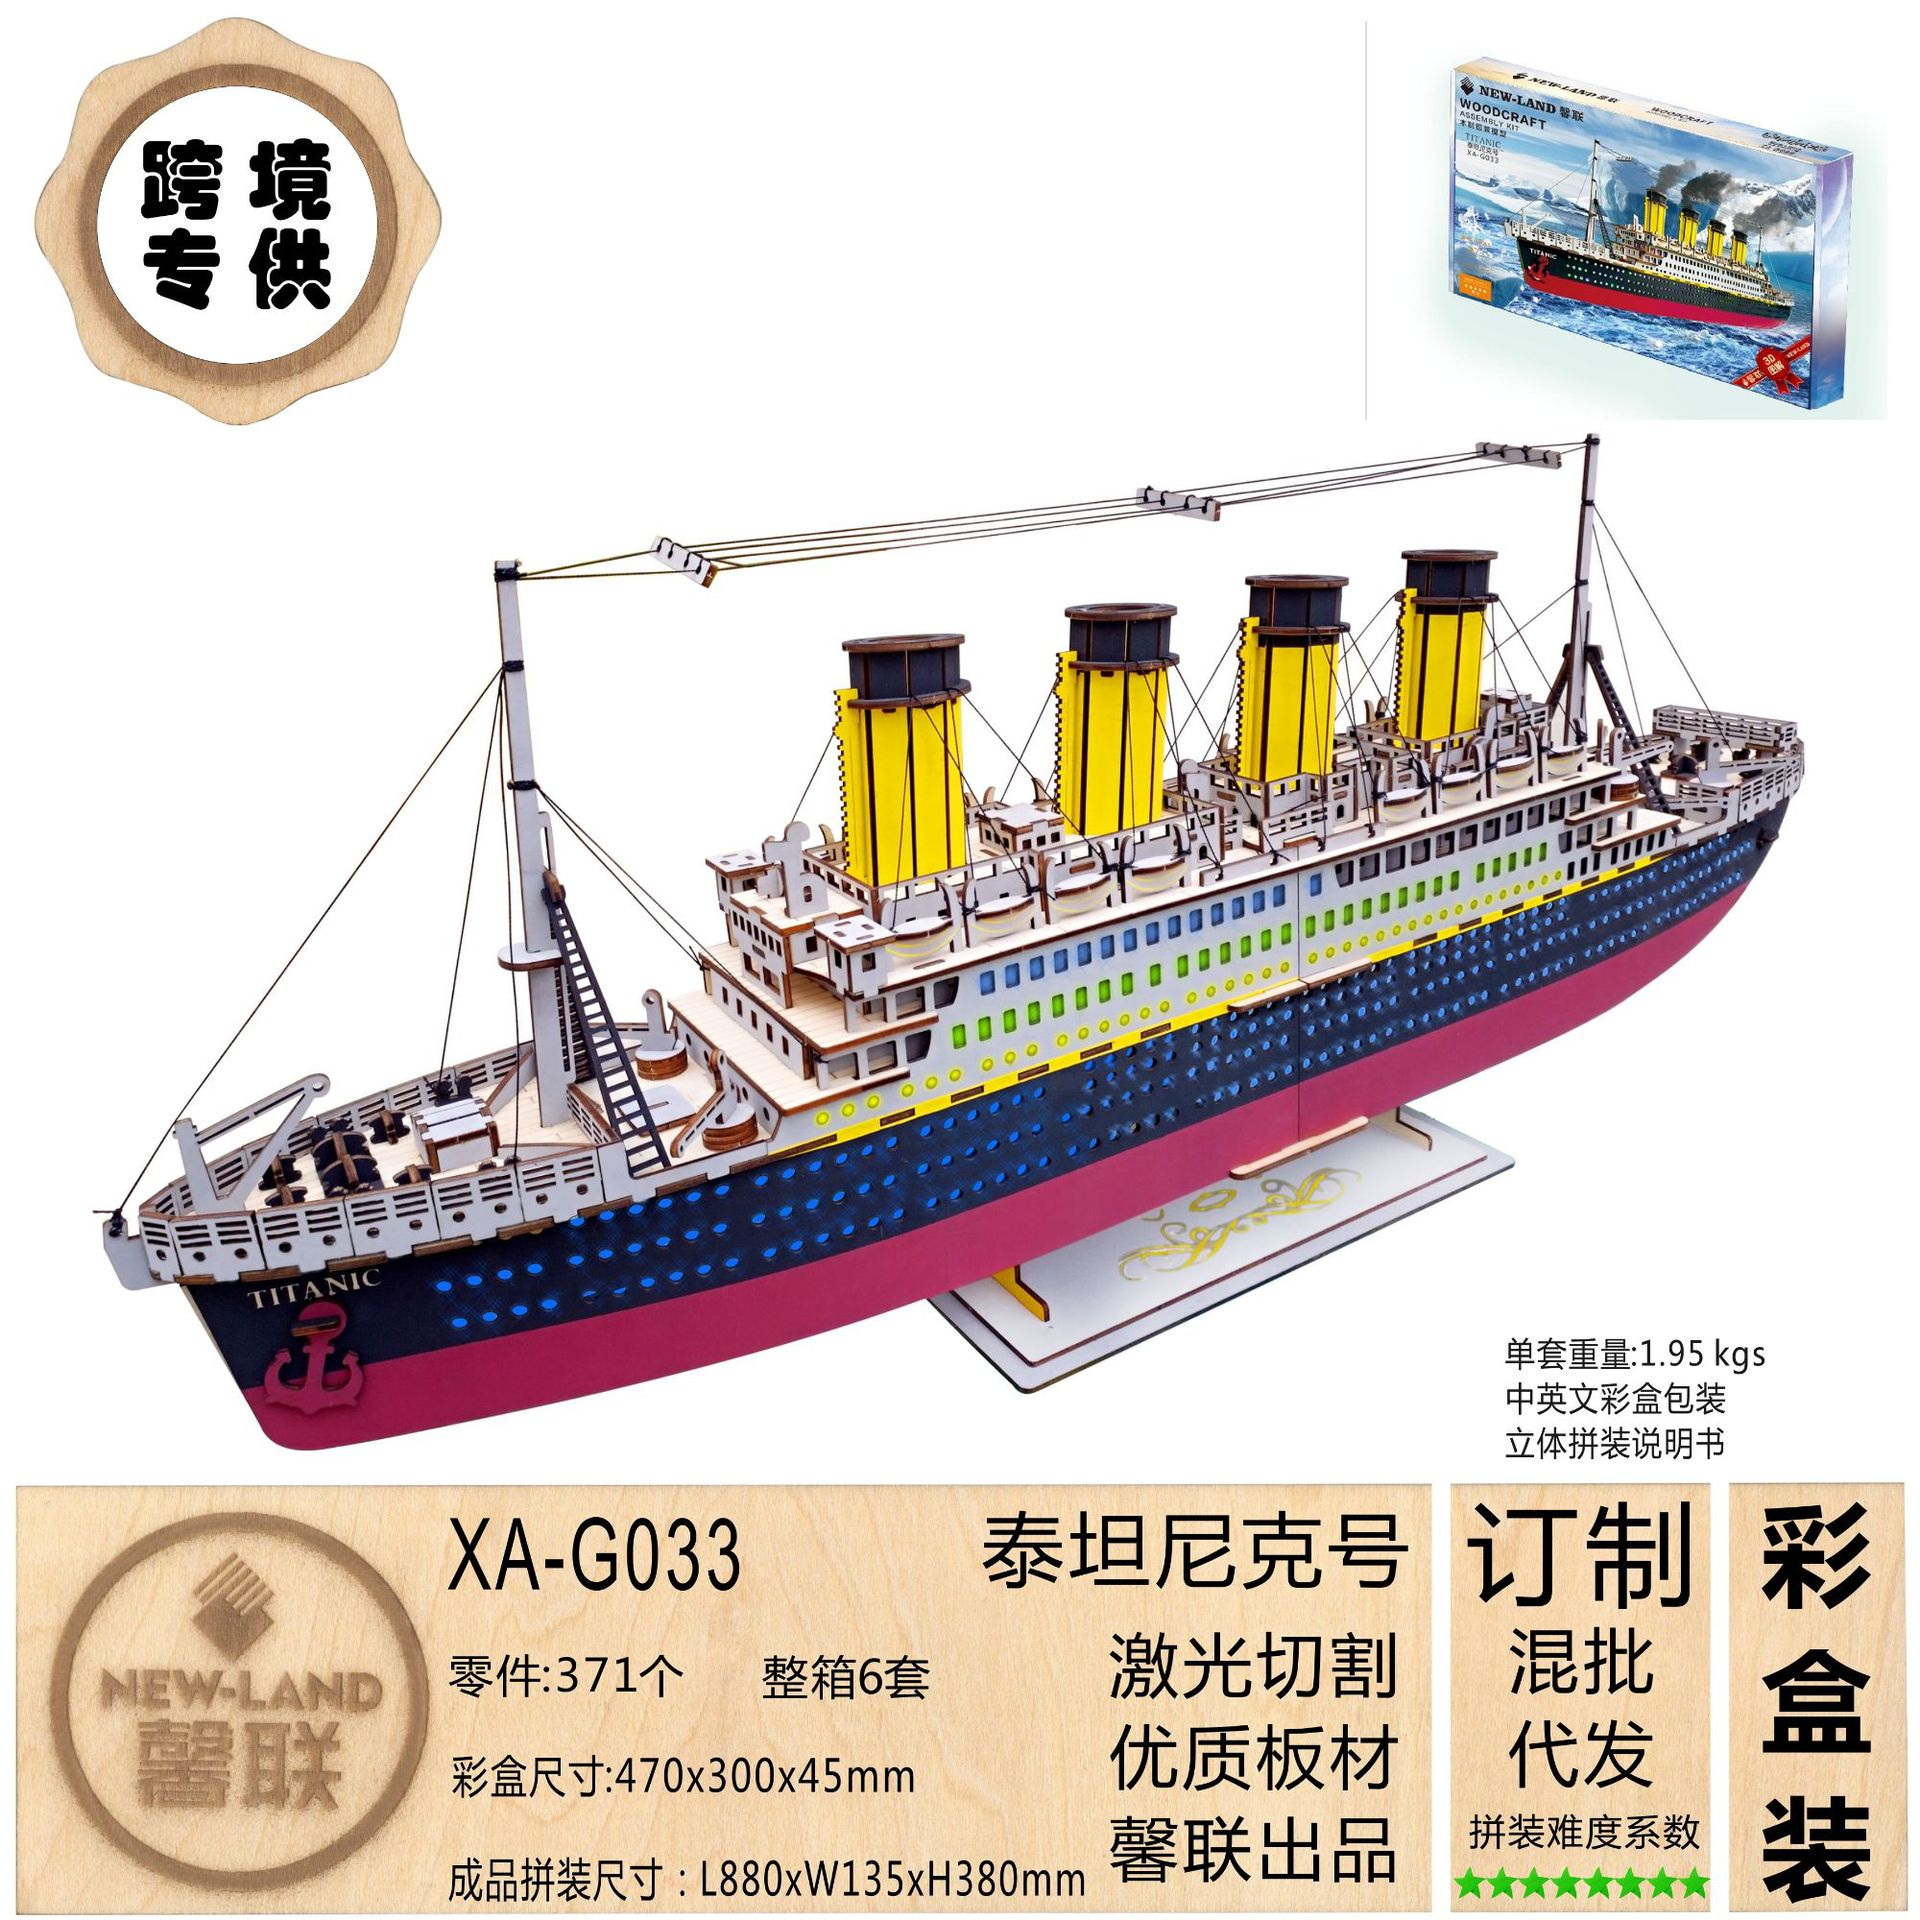 DIY dreidimensionale jigsaw puzzle junge DIY handgemachte spielzeug holz puzzle Titanic farbe box 3D modell - 3